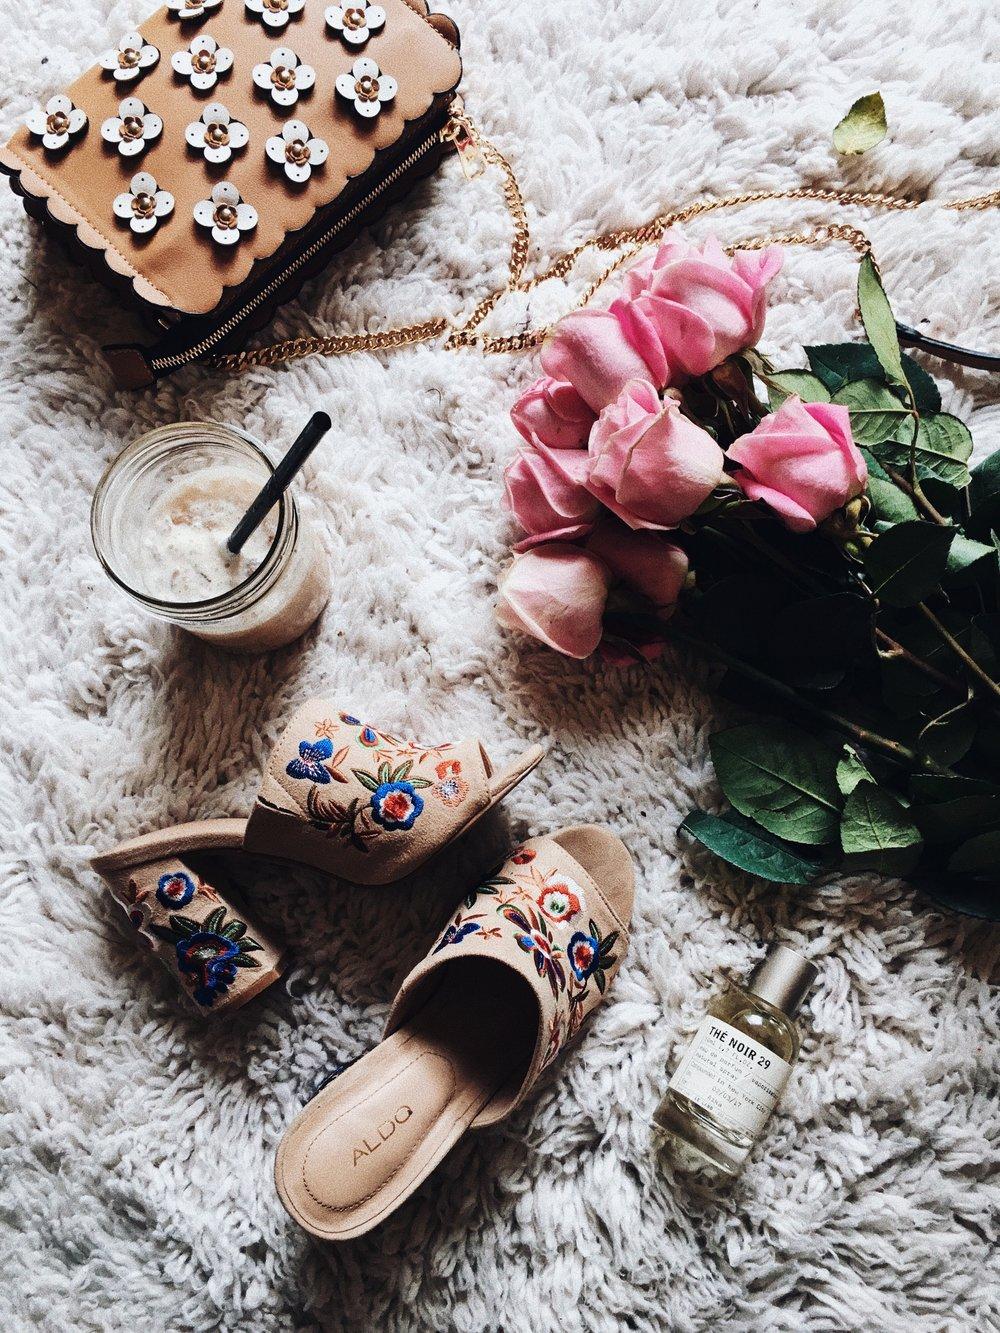 Aldo Yaessi Floral-Embroidered Mules-Pink Roses-Zara Floral bag - Le Labo Eau de Parfum - Aika's Love Closet - Seattle Fashion Style Blogger - Japanese